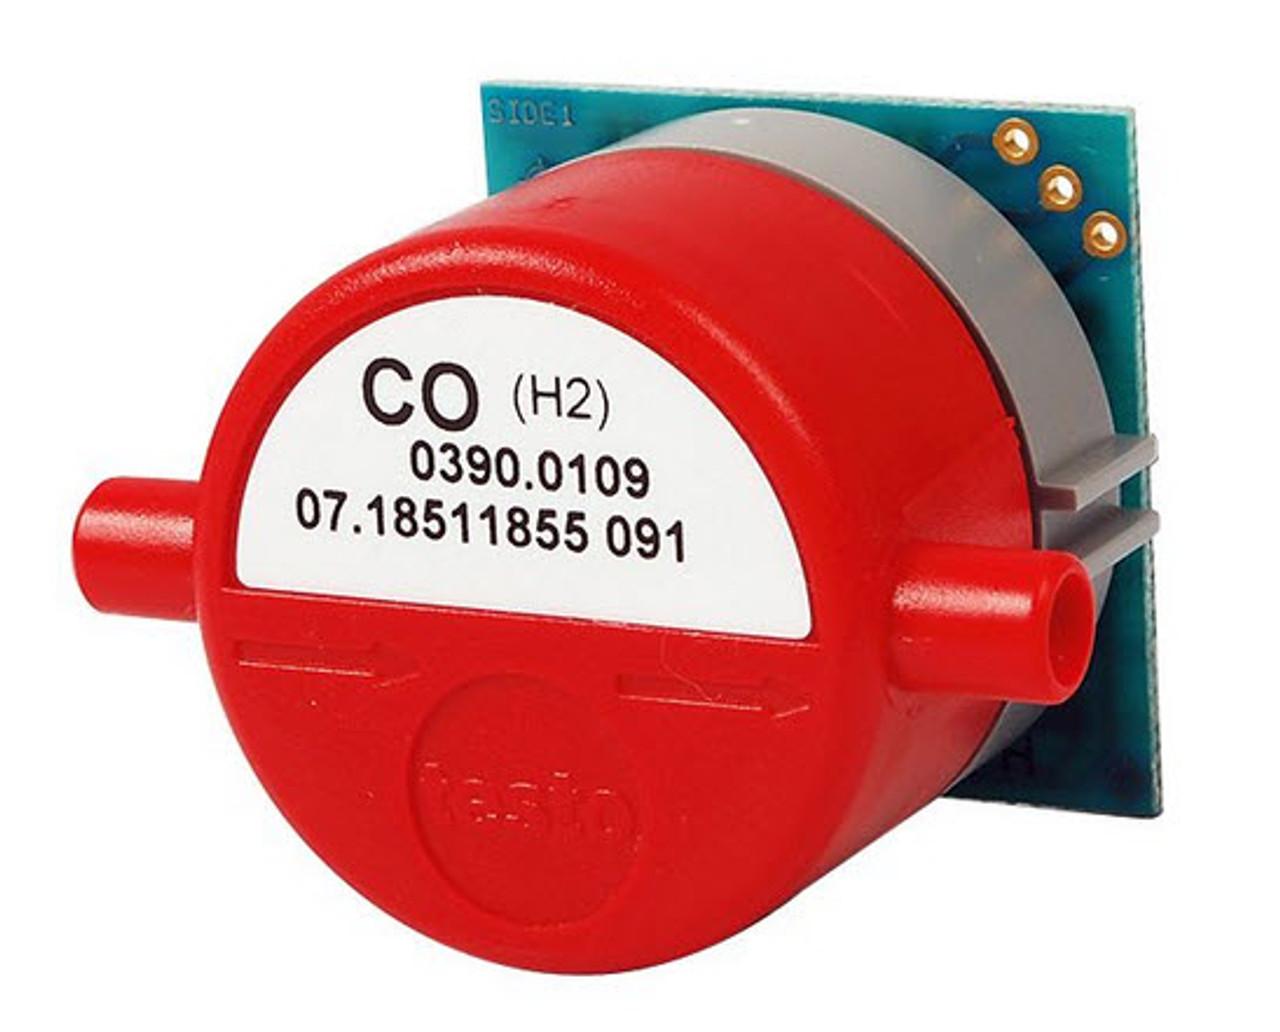 Spare CO measuring cell (H2 compensated) for testo 330-2, testo 330-3, 327-2